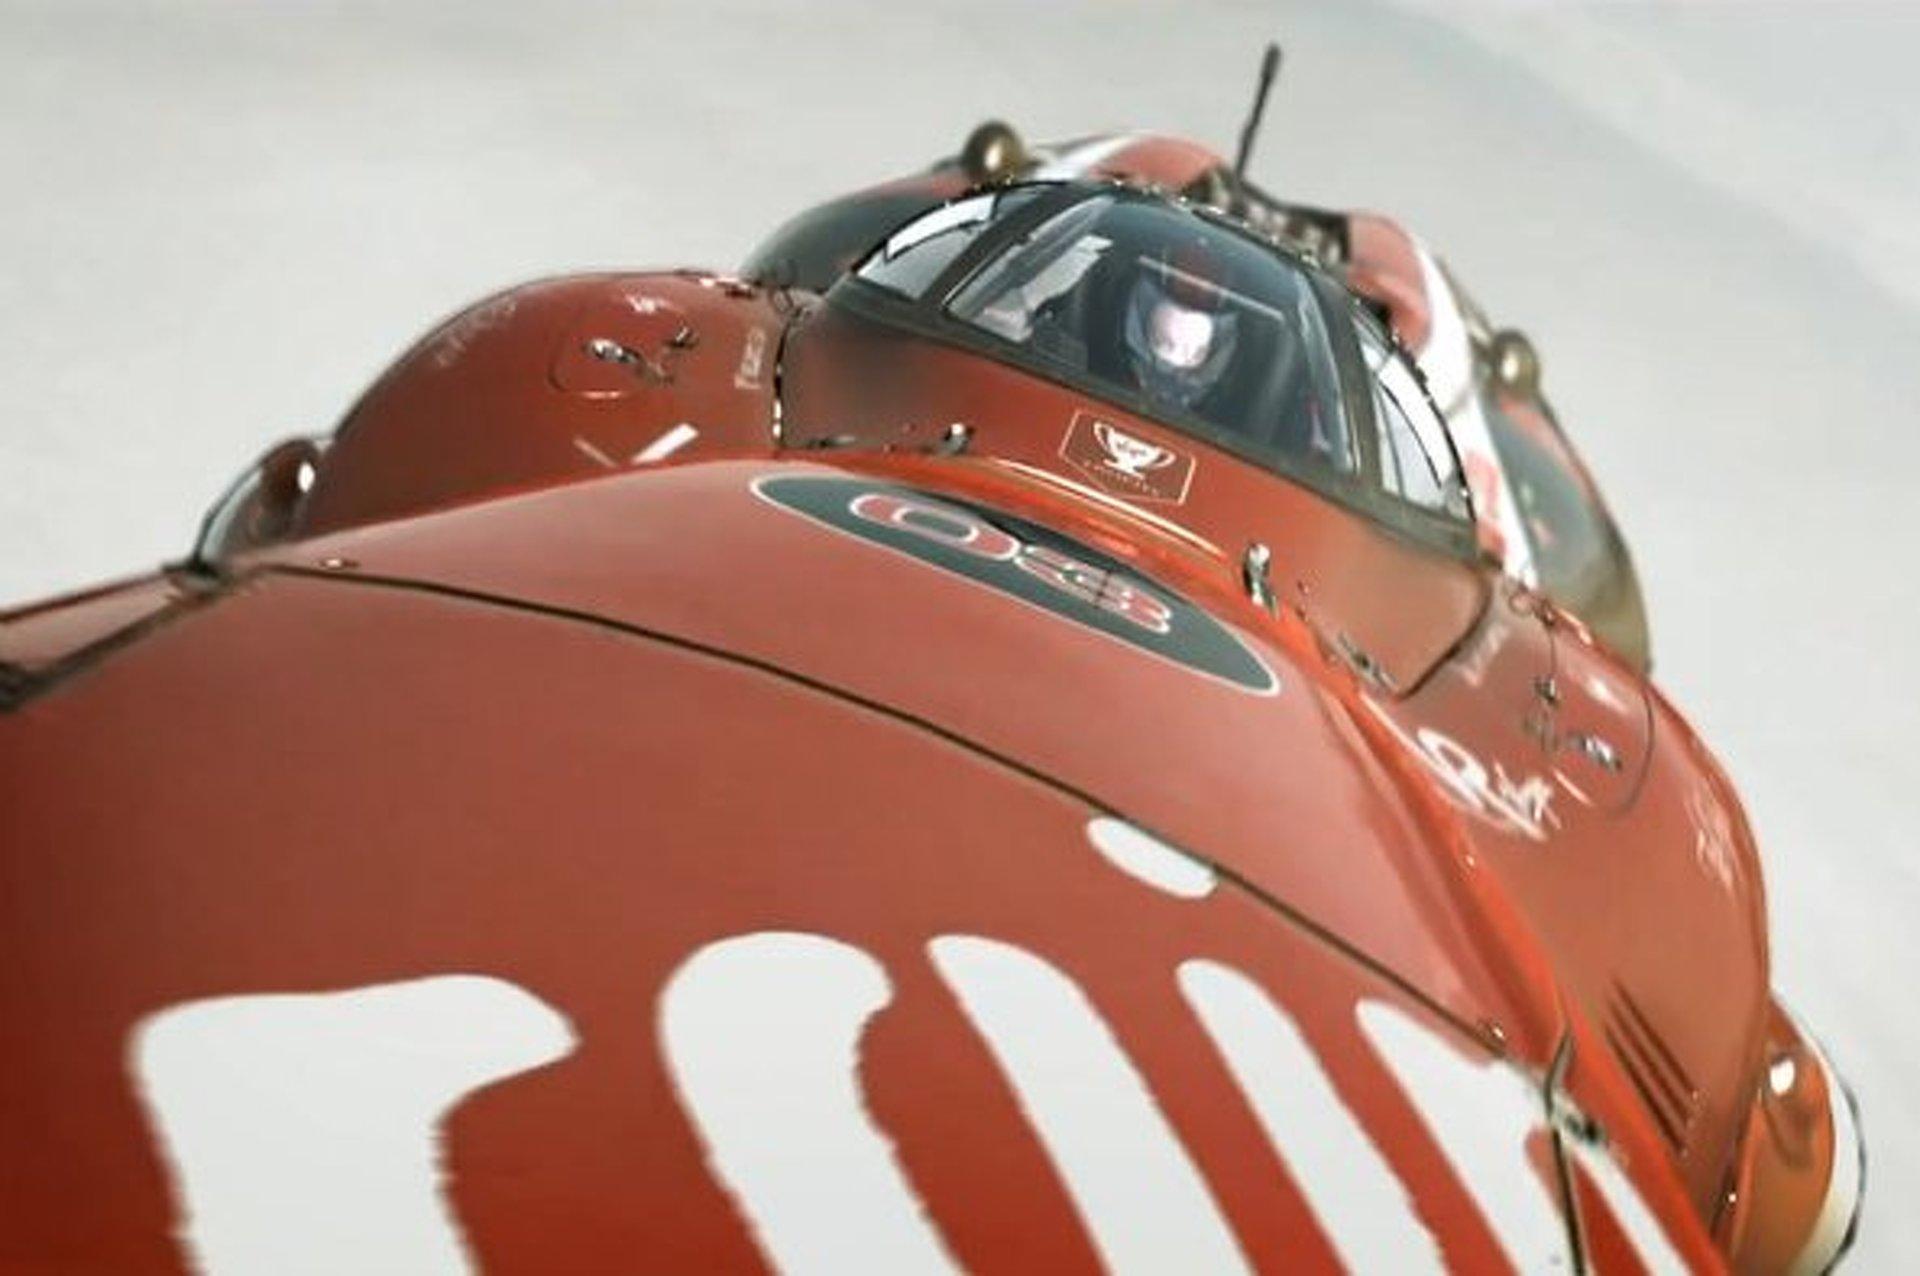 'Shogun Tango' Mini-Movie Previews Sci-Future of Bonneville Racing